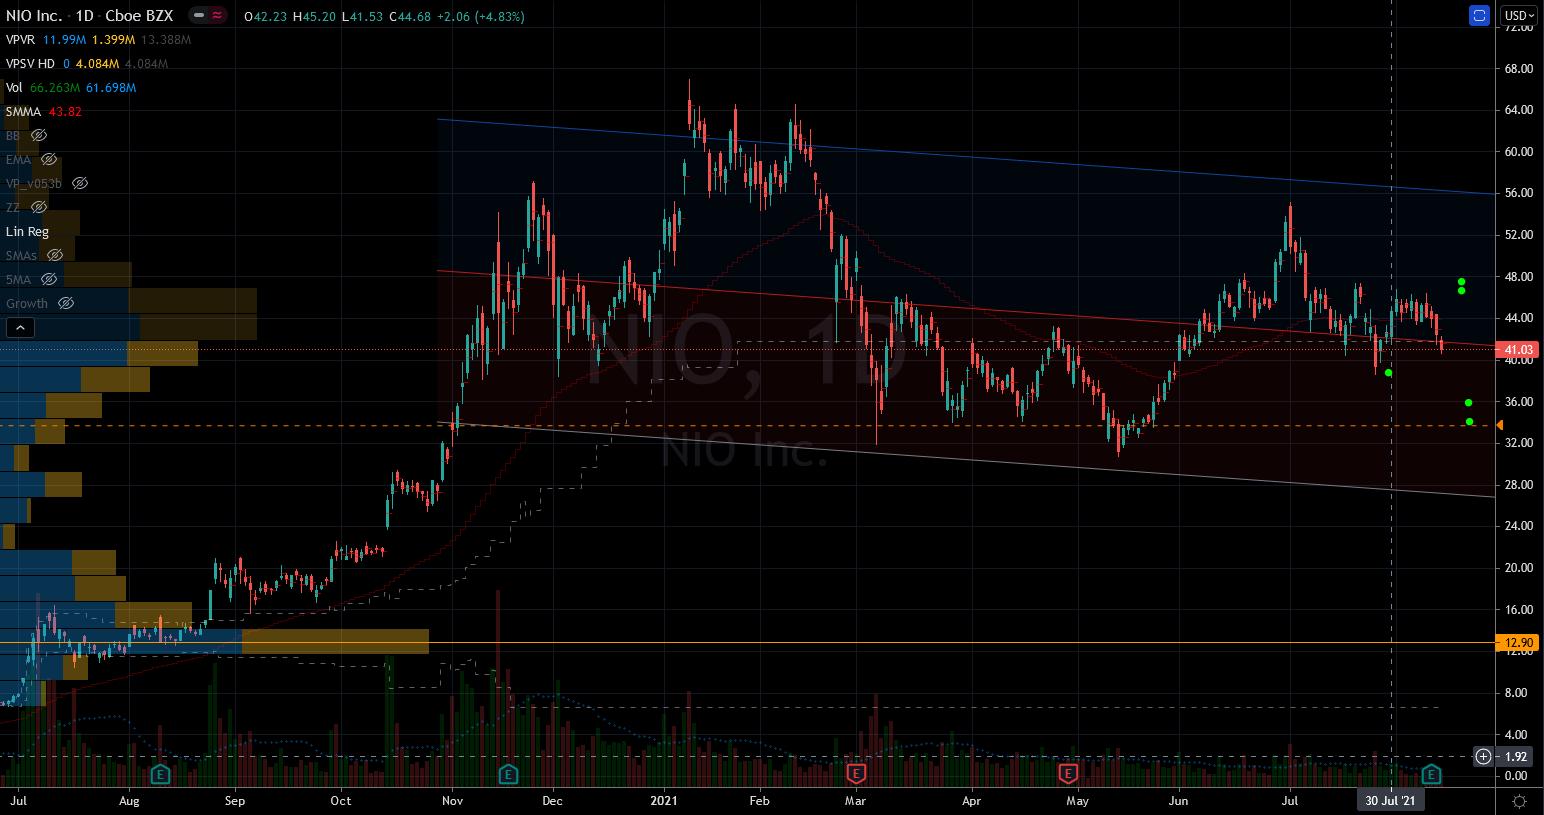 Stocks to Buy: Nio (NIO) Stock Chart Showing Support Zones Below